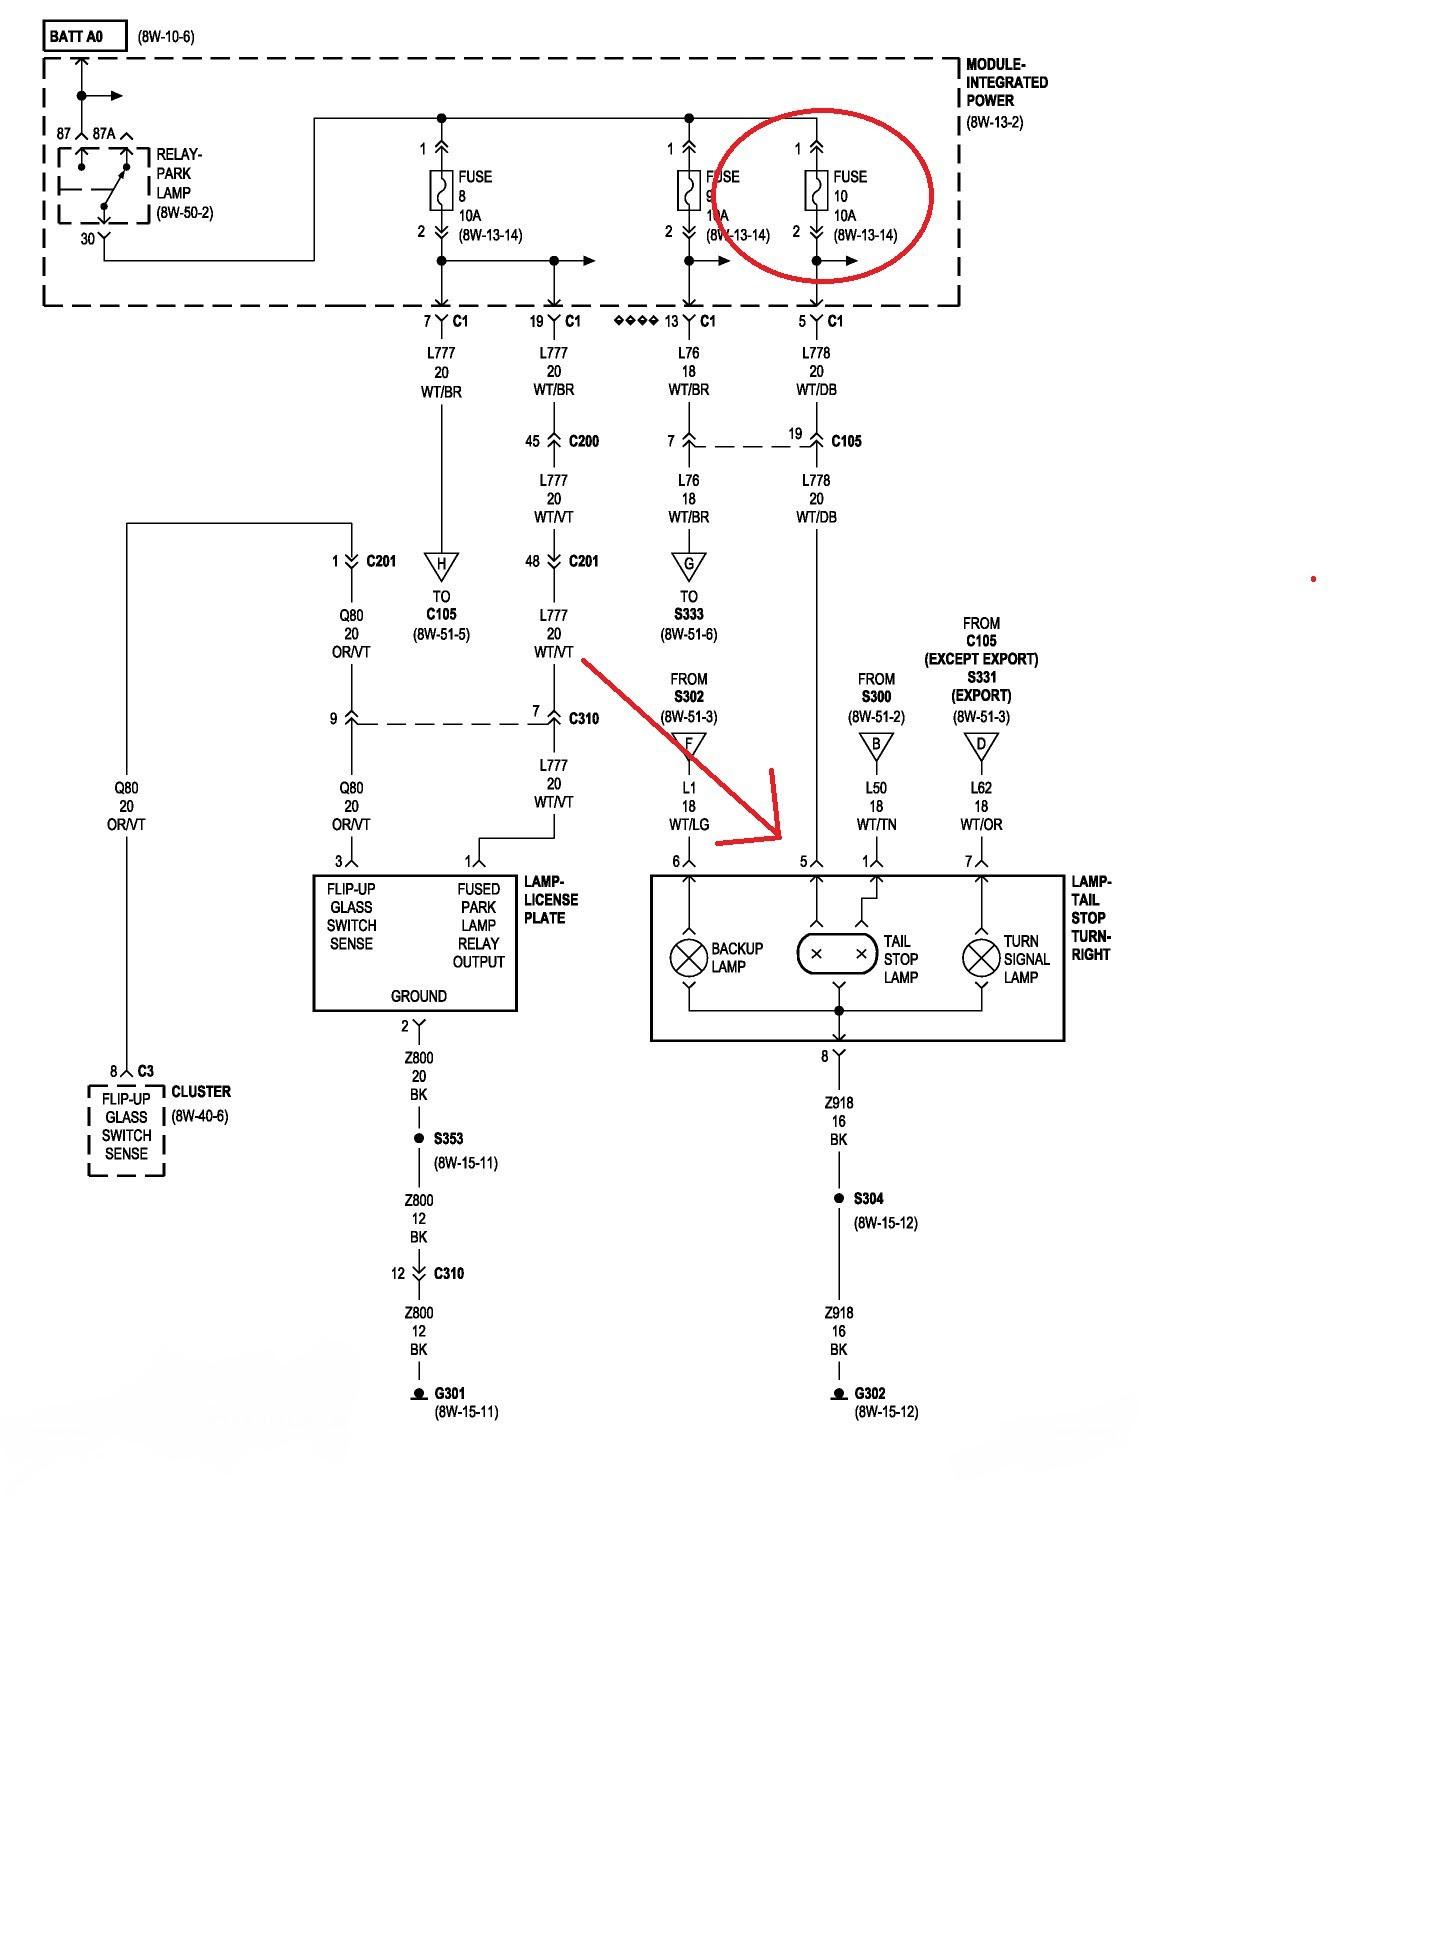 1996 Jeep Cherokee Tail Light Wiring Diagram - Wiring Diagram